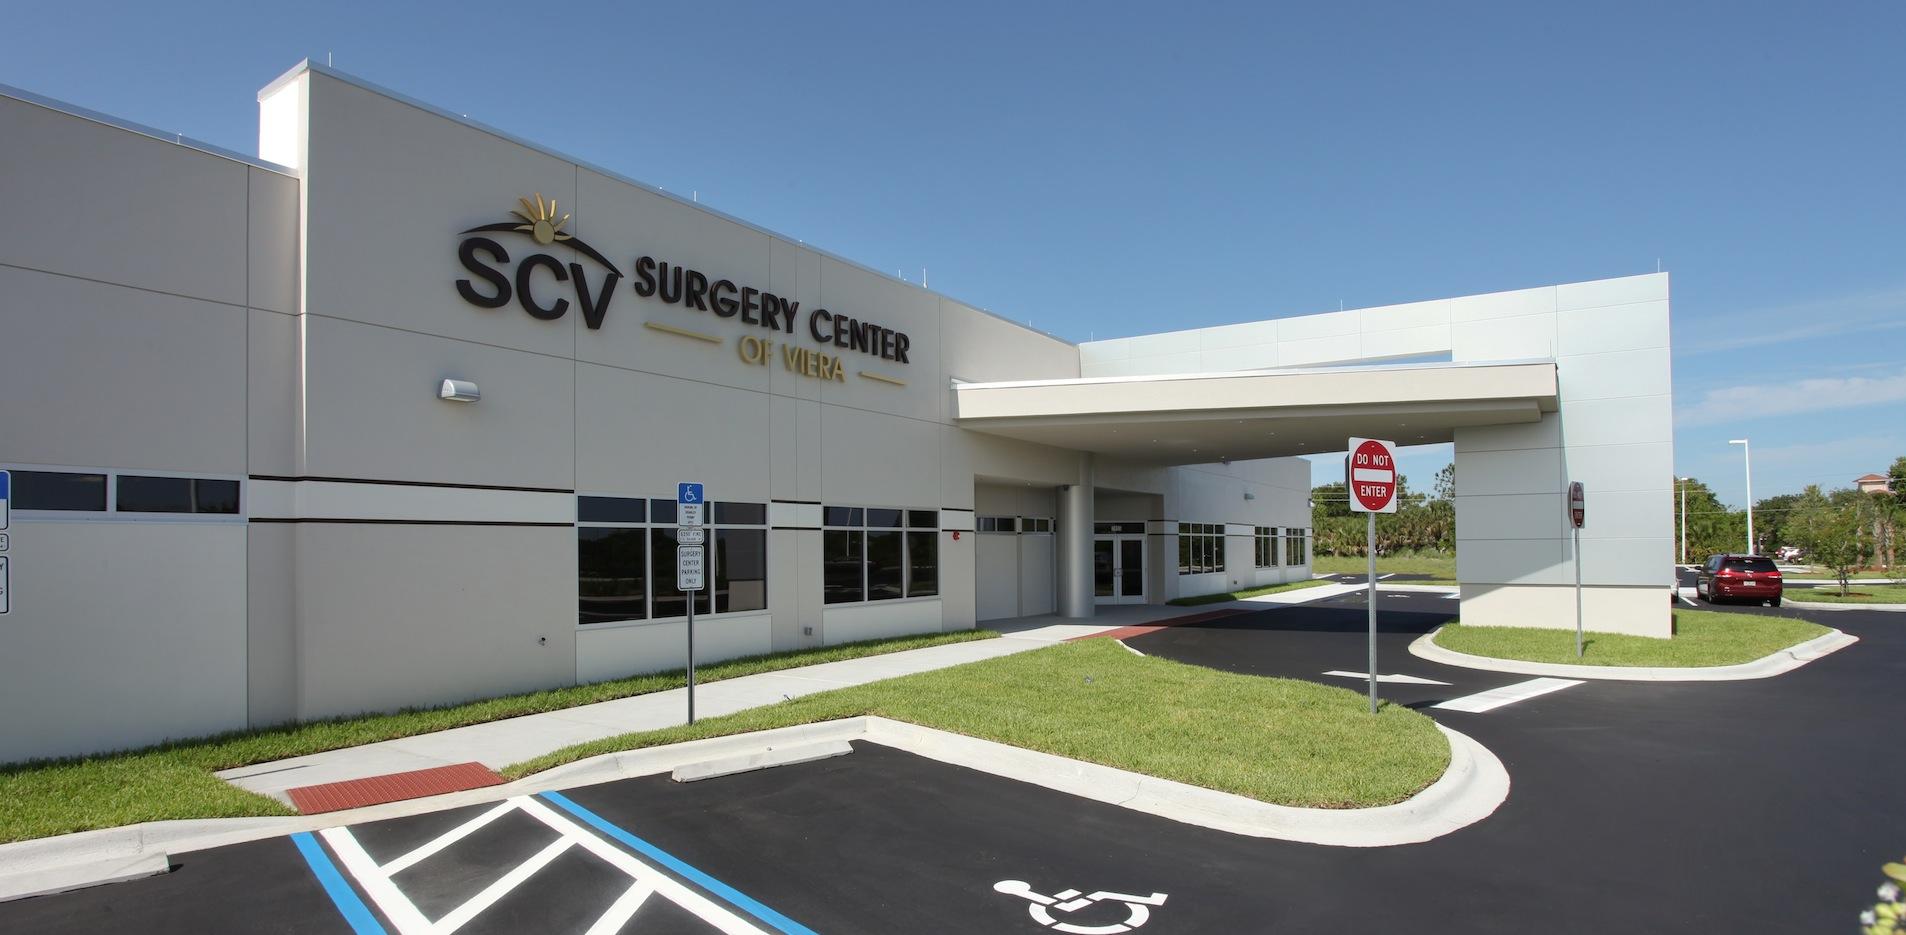 Surgery Center of Viera - Exterior